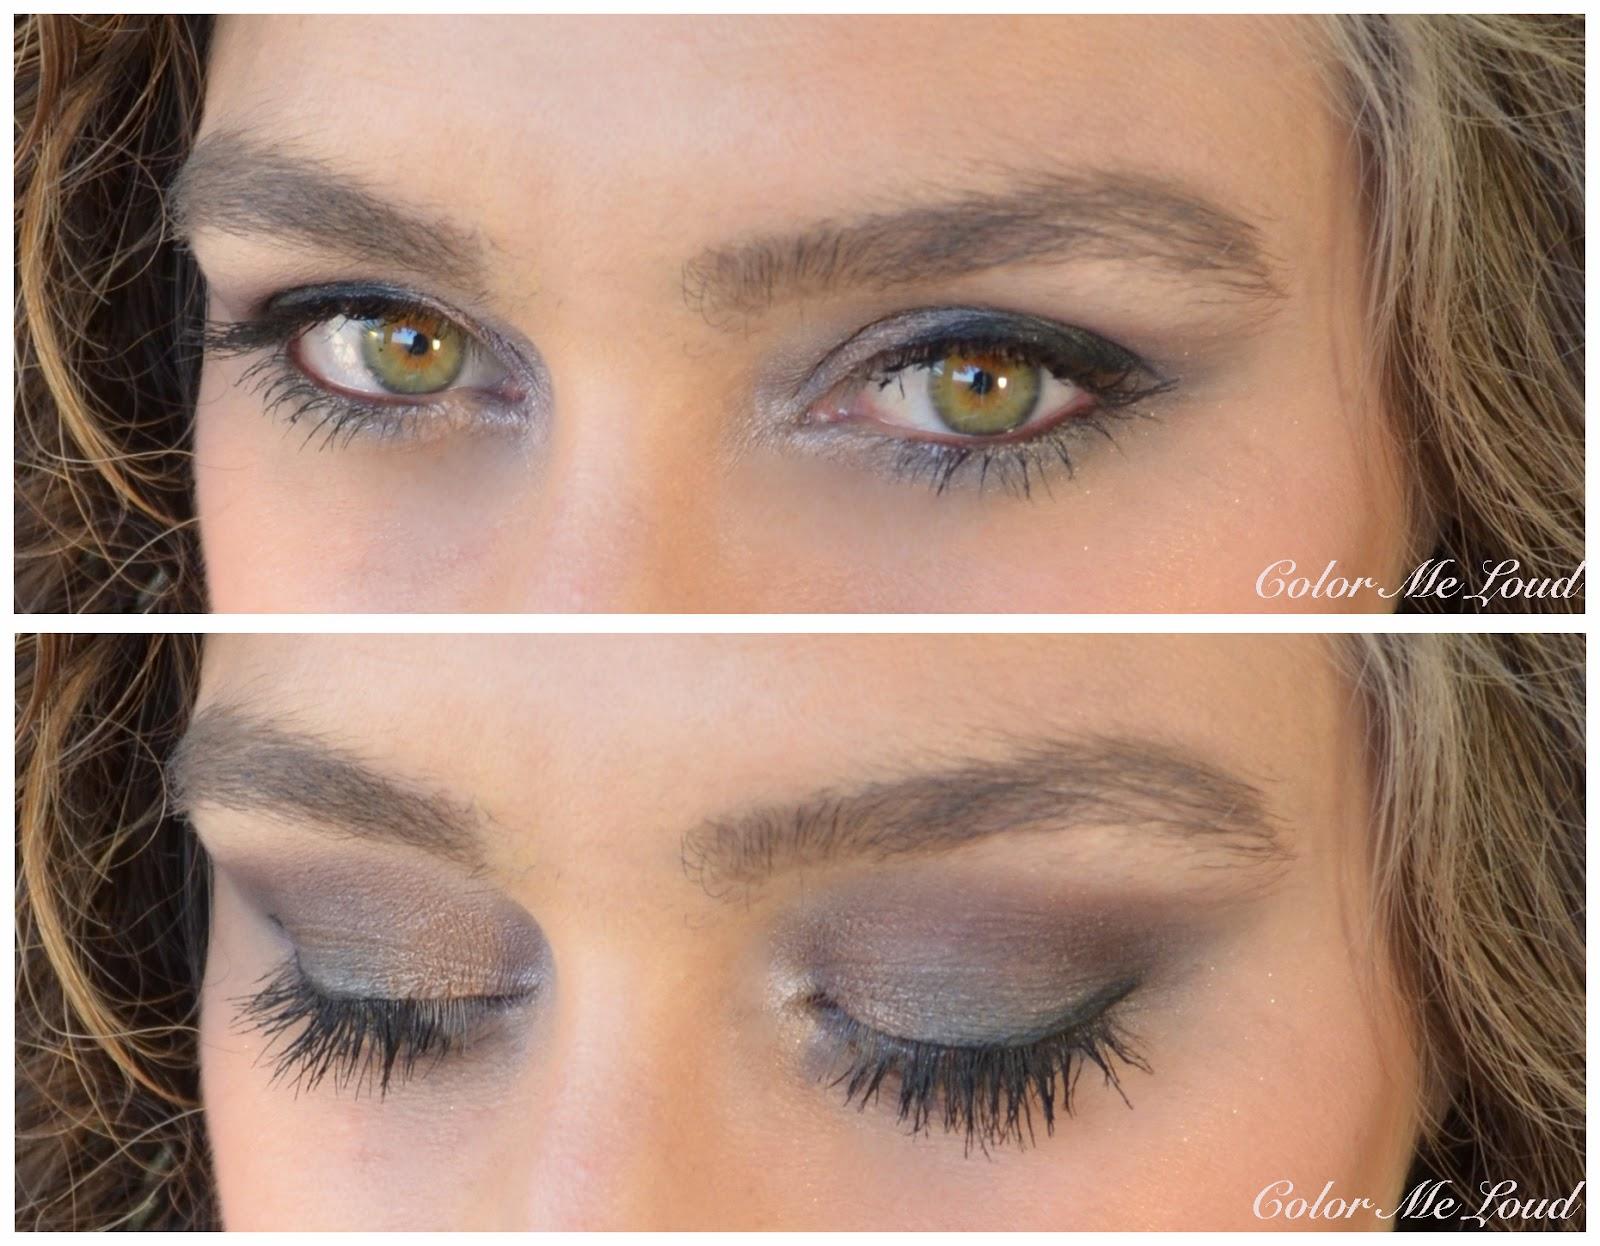 Ysl couture variation 10 color eye palette 2 tuxedo review in action ysl couture variation 10 color eye palette 2 tuxedo ccuart Gallery